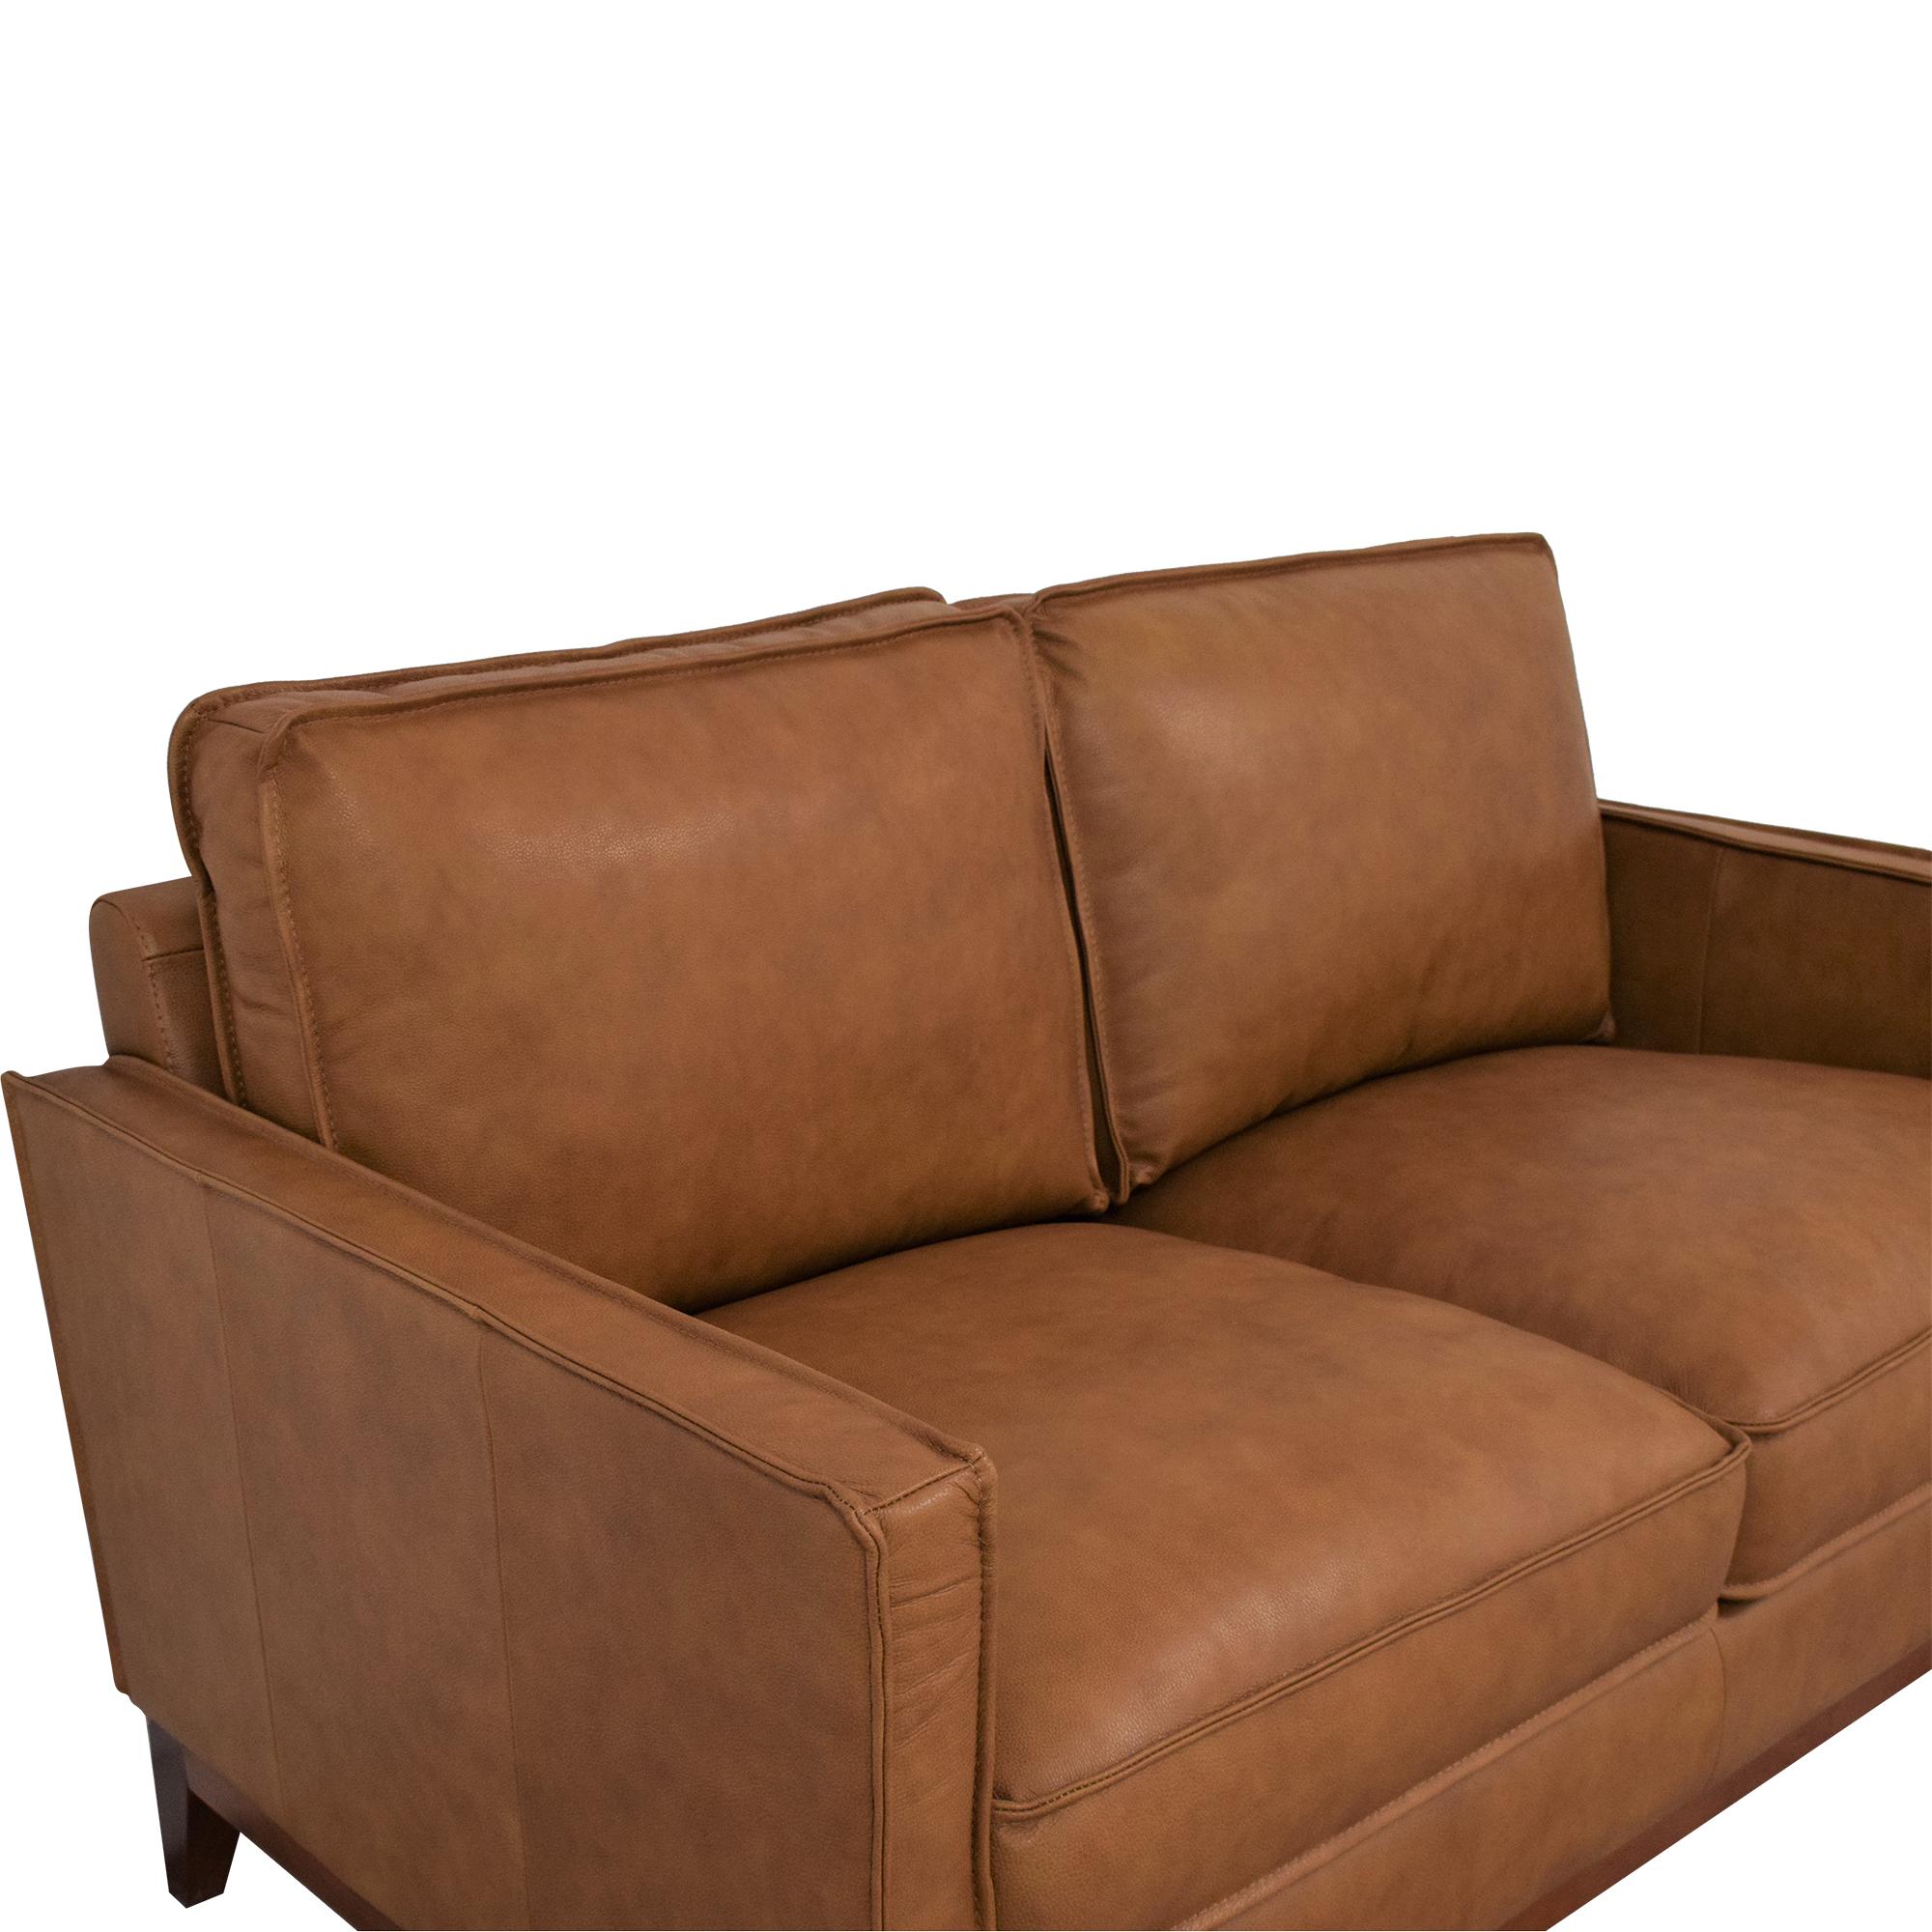 Leather Italia Leather Italia Newport Loveseat price